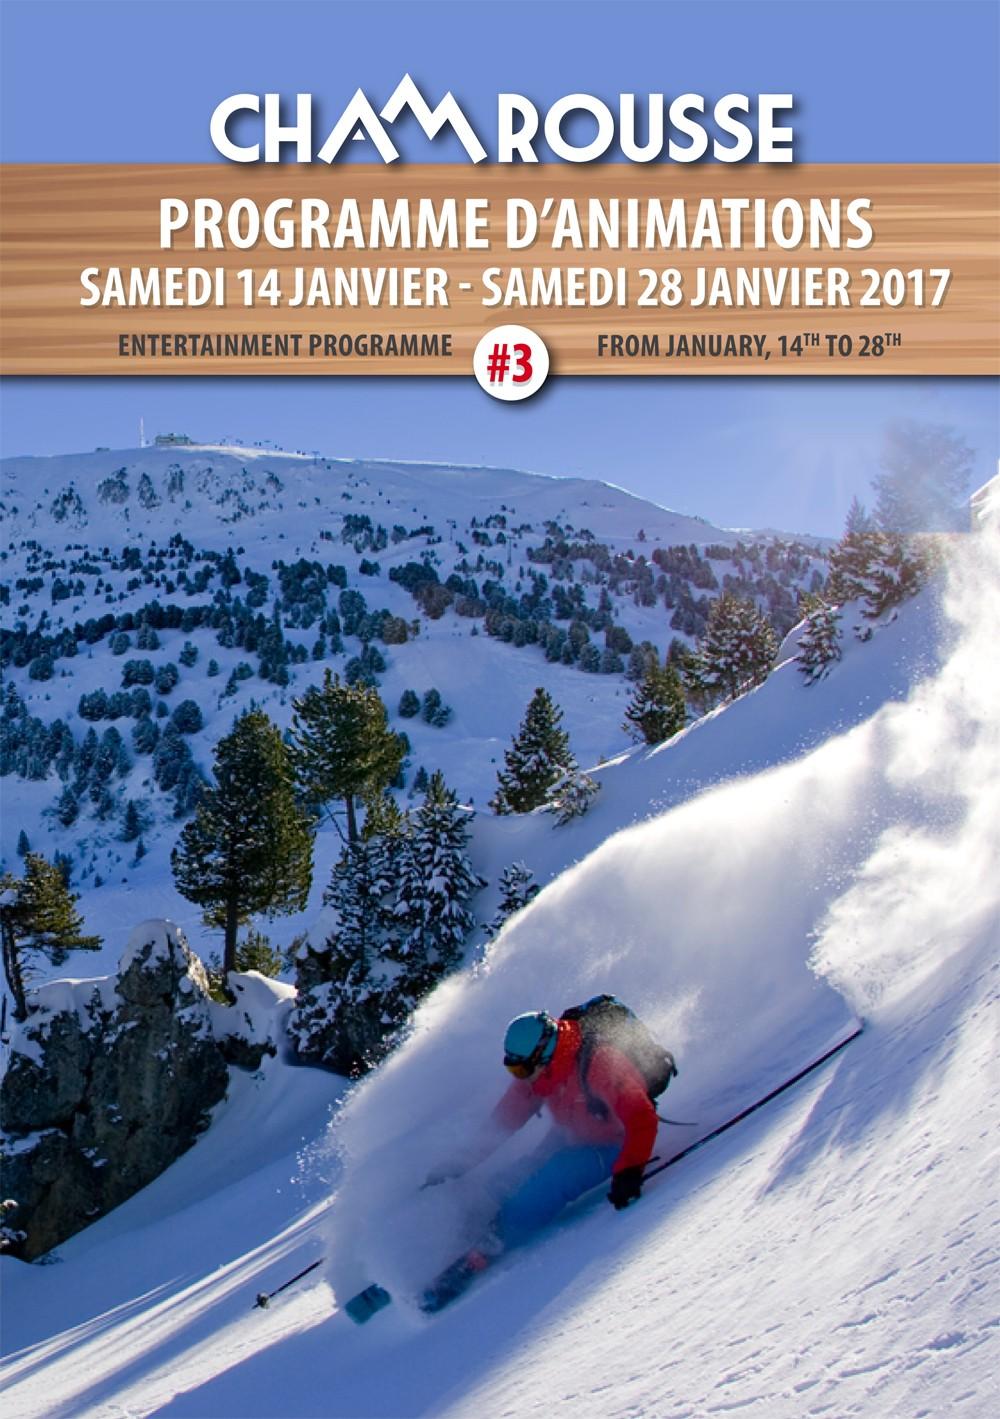 Programme animations hiver 2016-17 Chamrousse